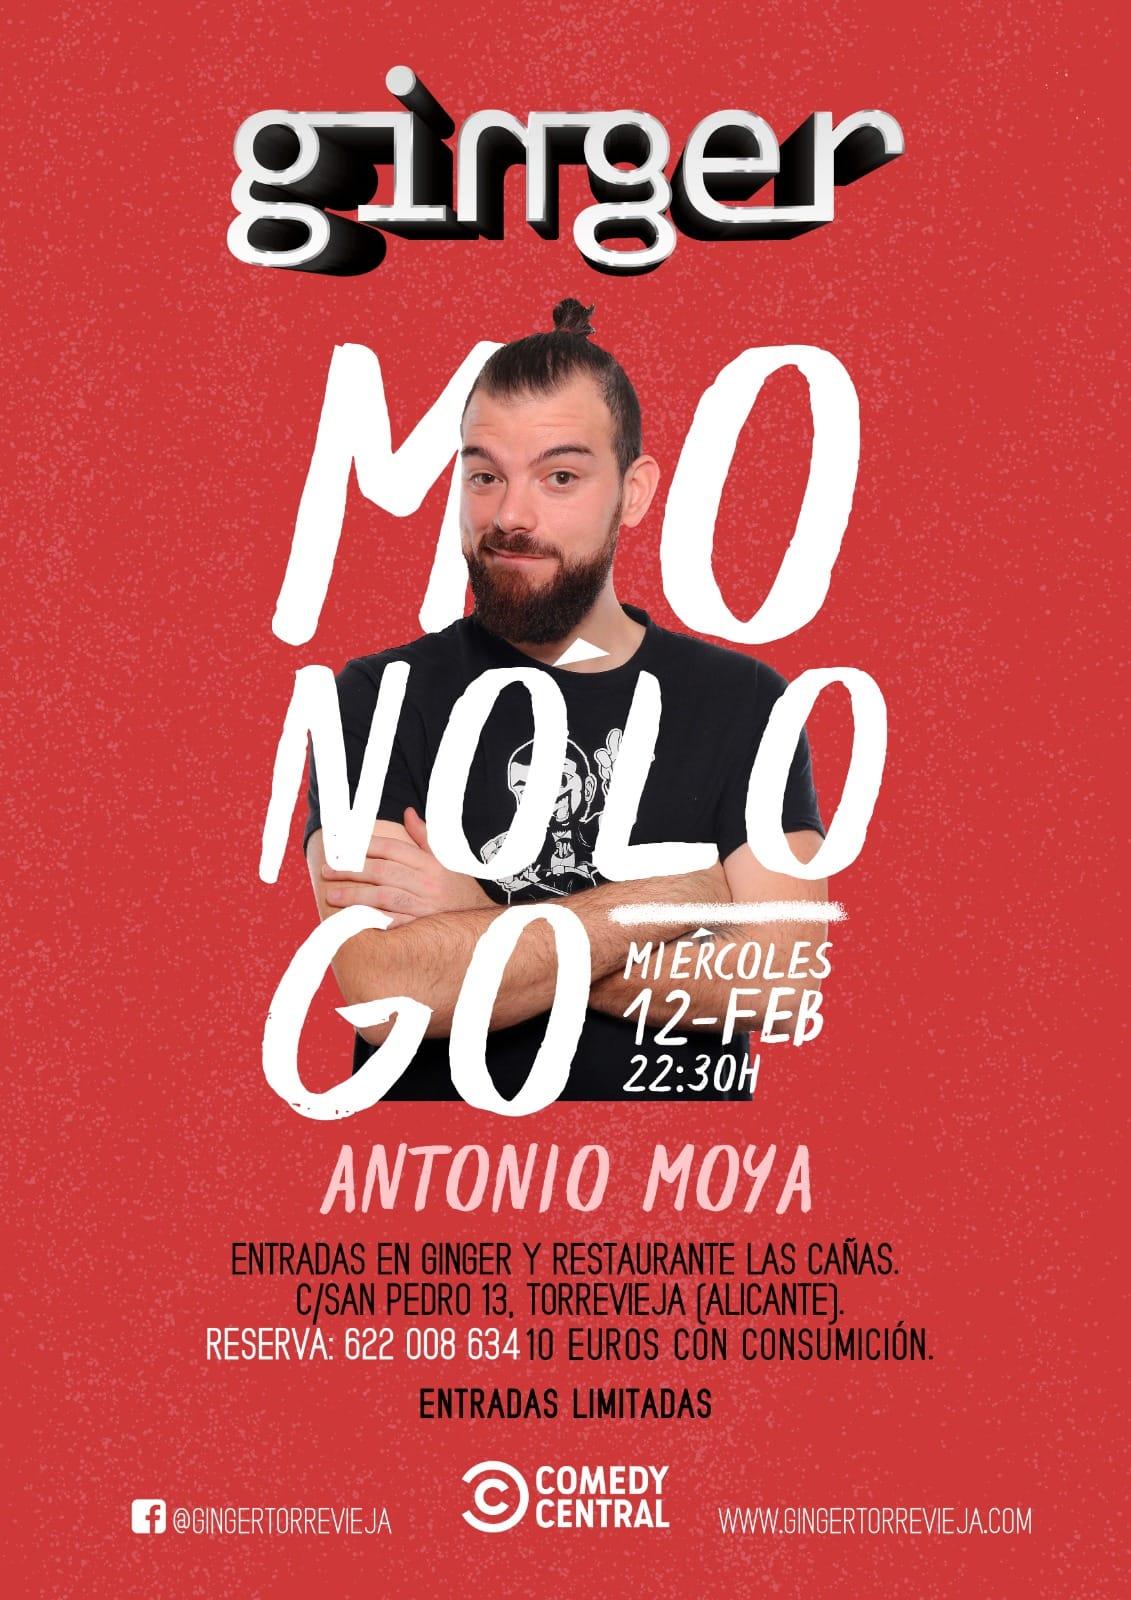 Monologo Antonio Moya ginger Torrevieja 2